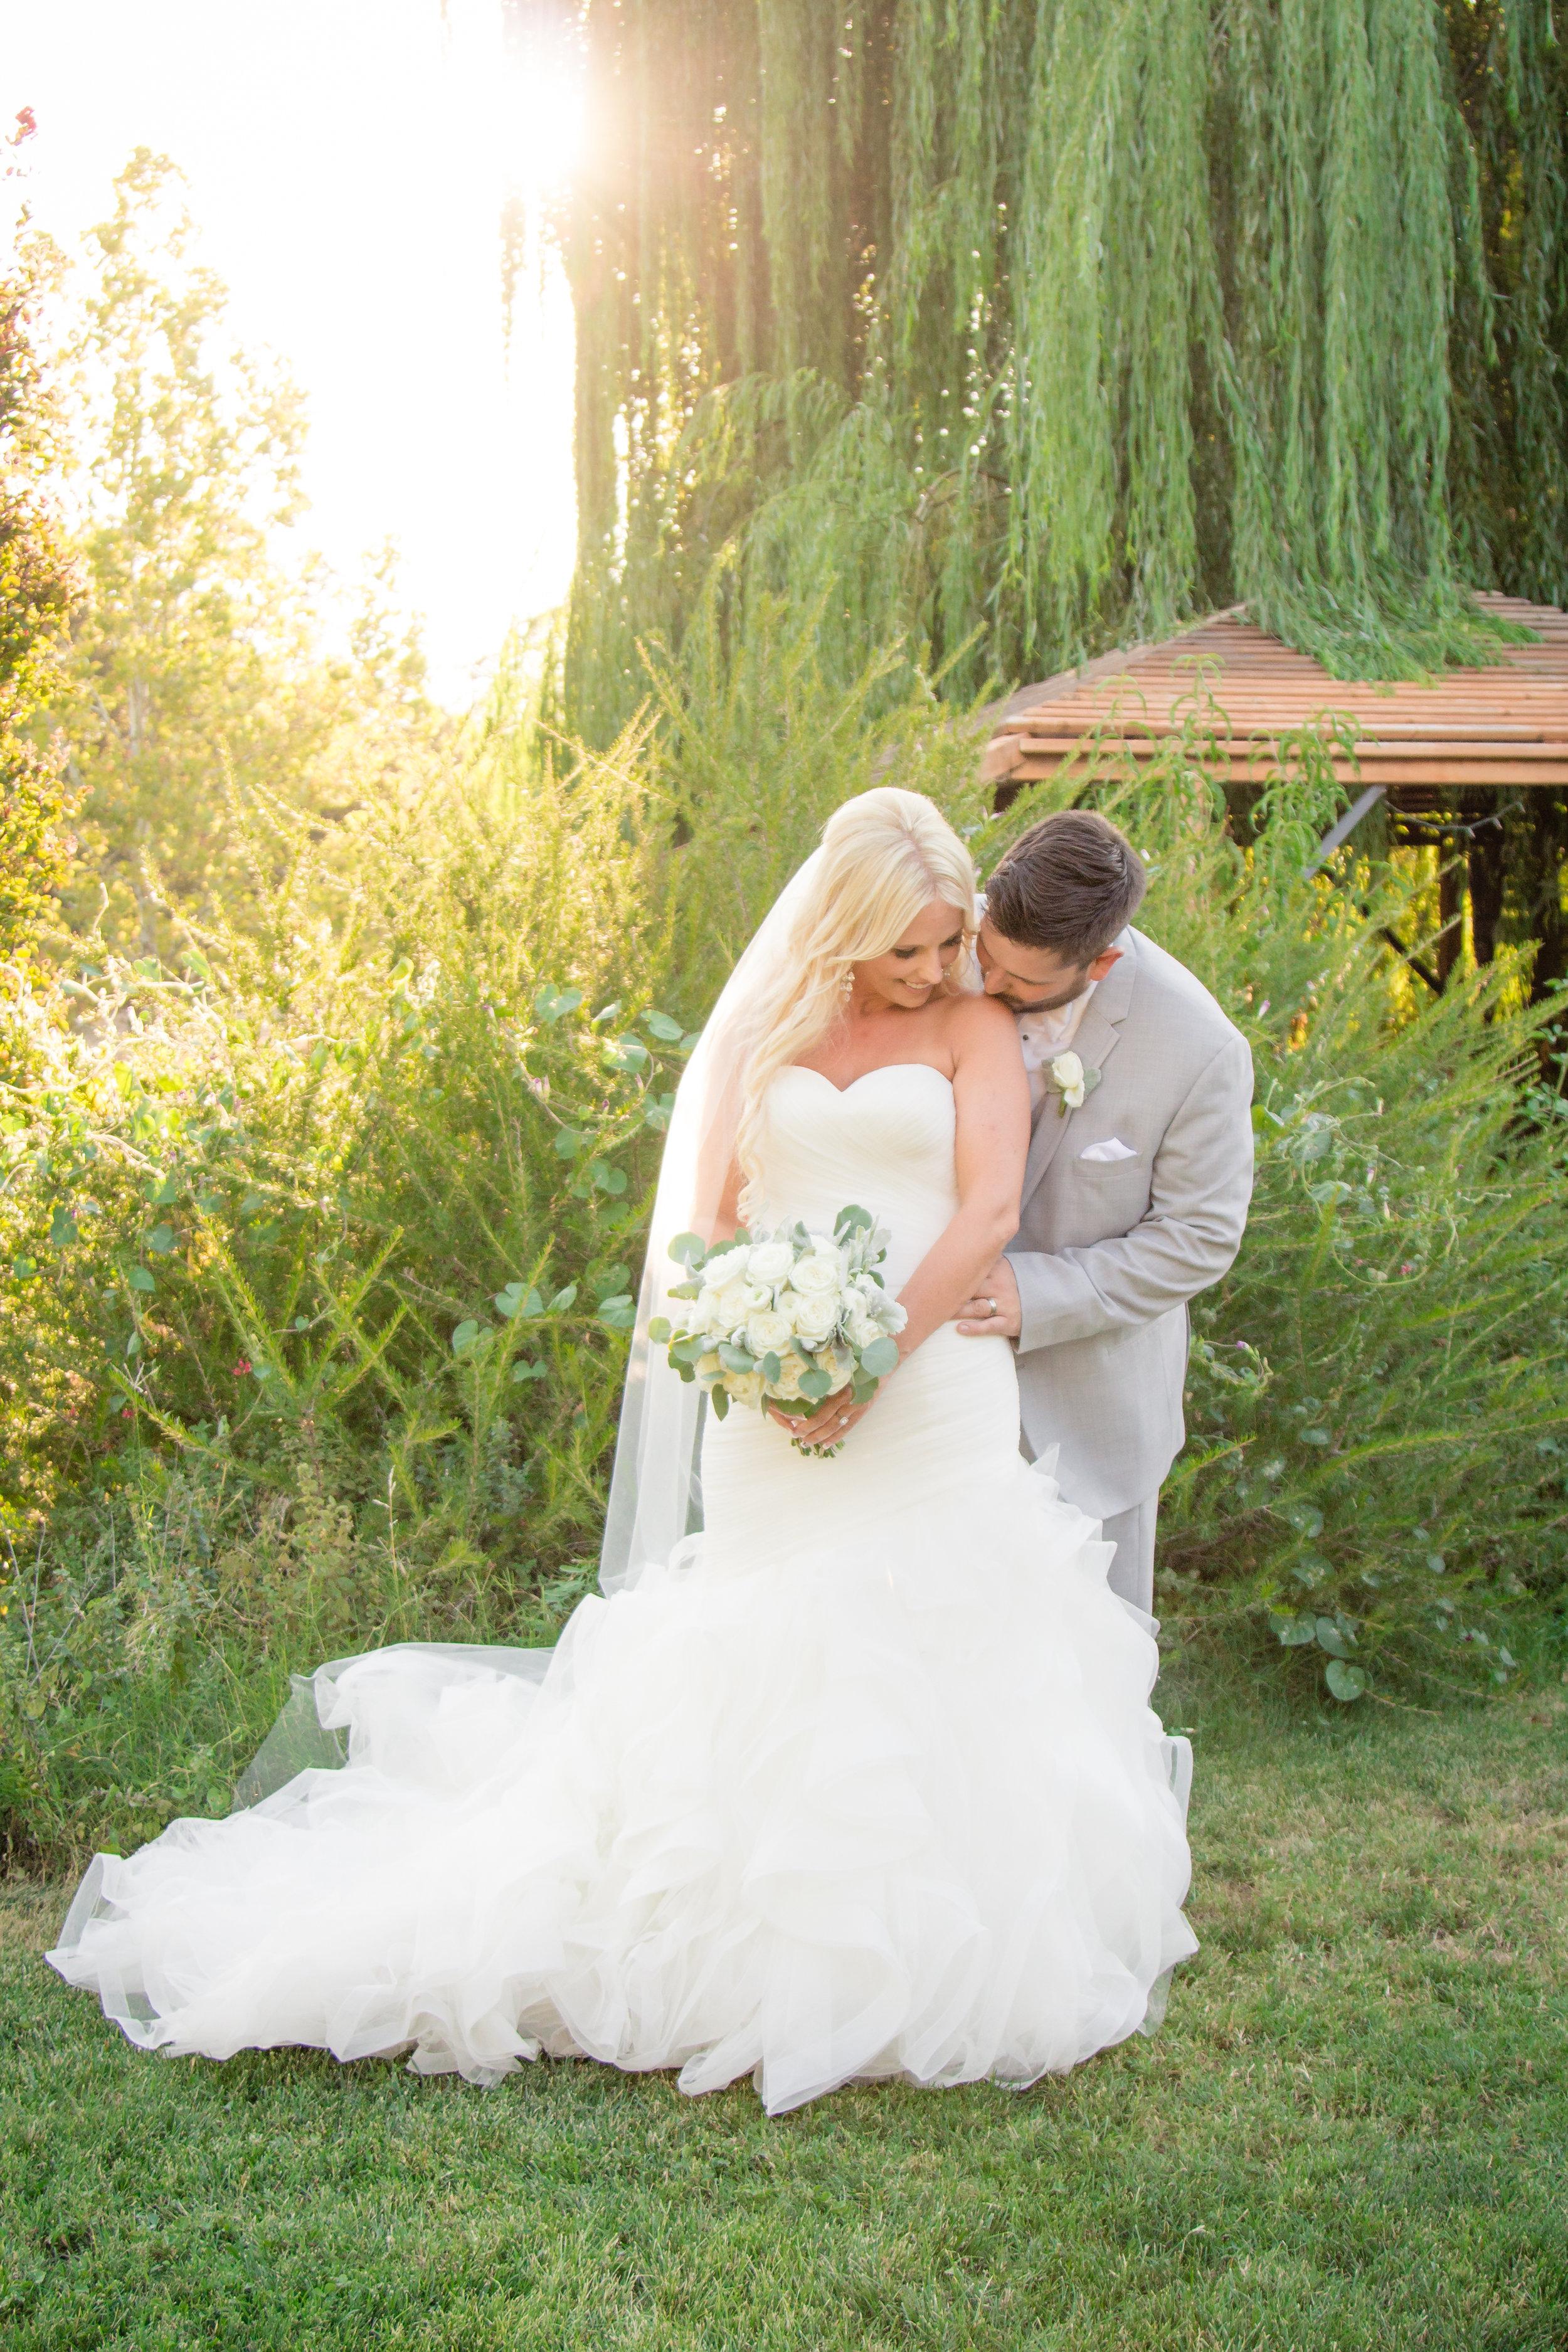 White Ranch Events - Chico - Ashley Teasley Photography - Sacramento Wedding Photographer21.JPG